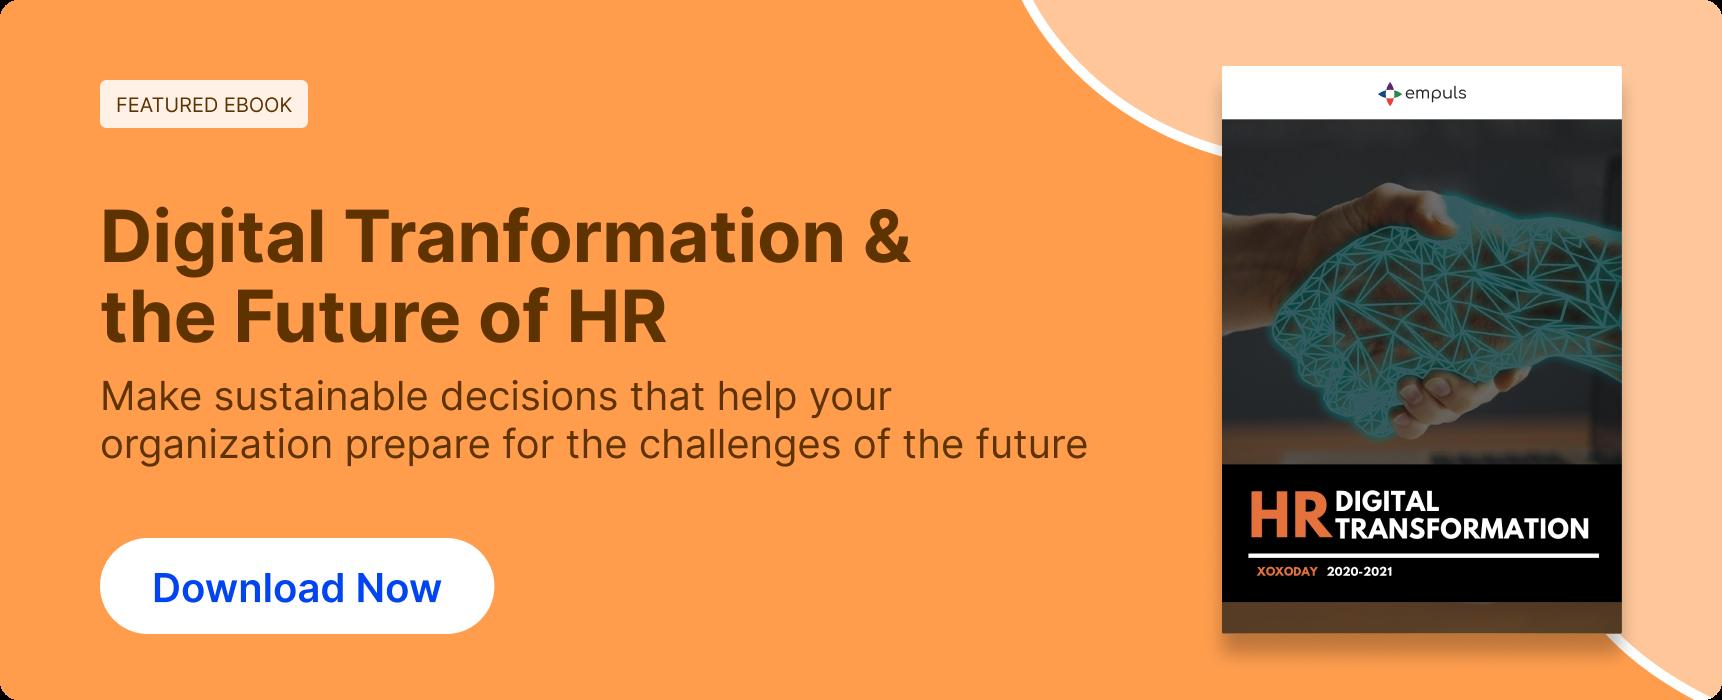 HR Digital Transformation Guide